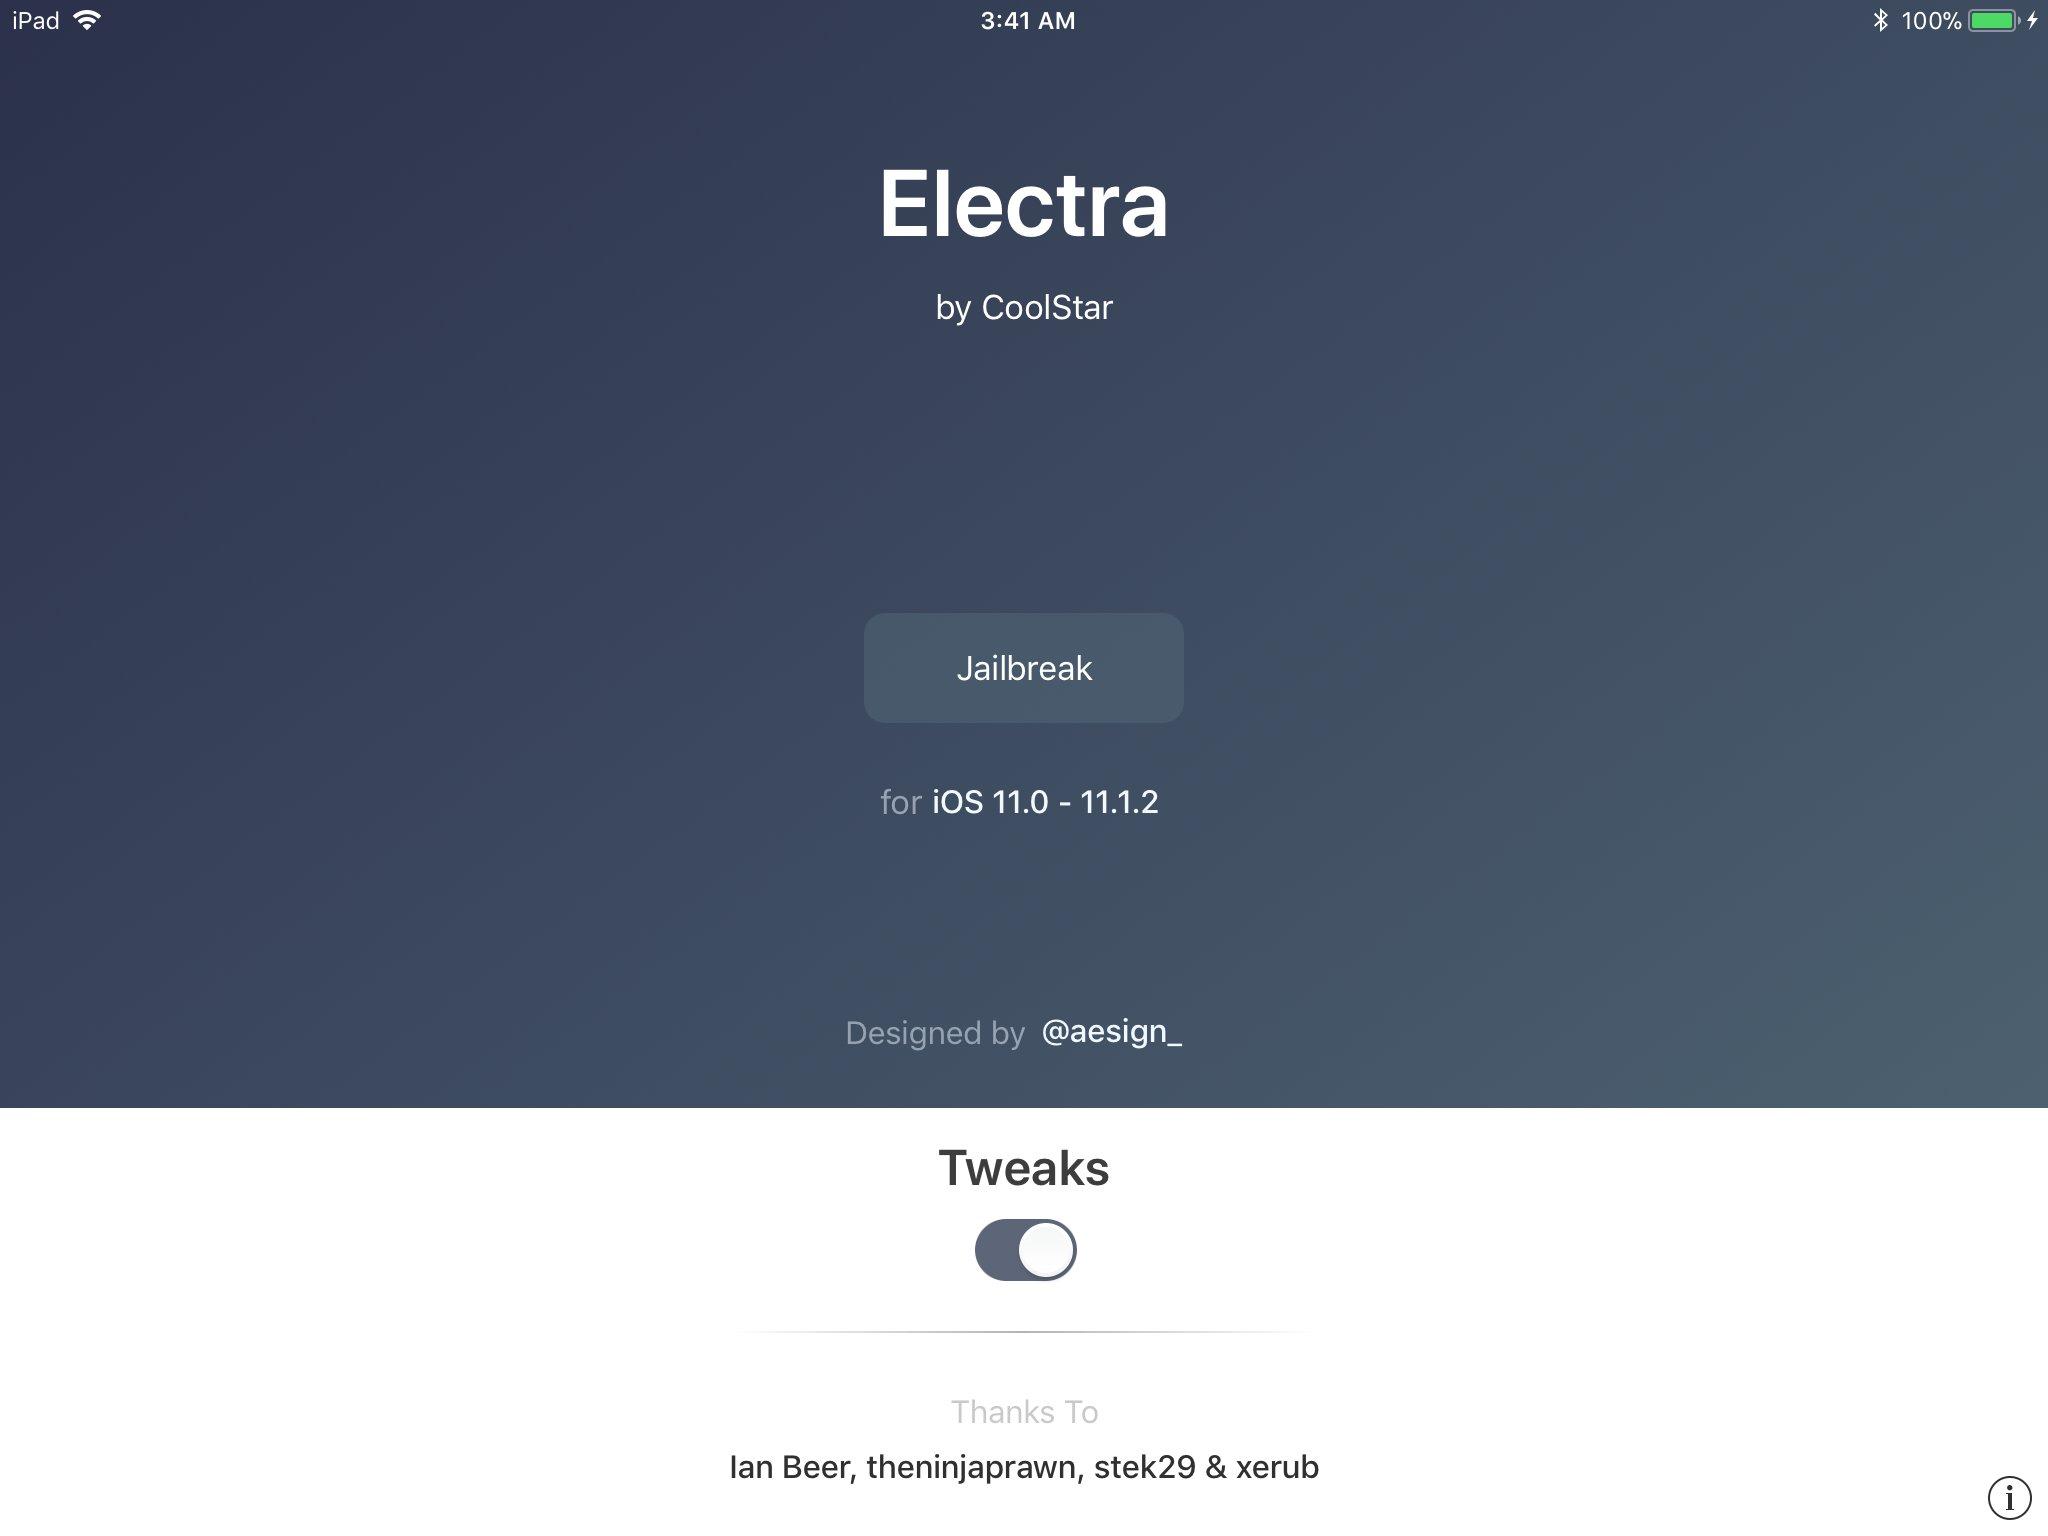 electra 1 - Coolstar ra mắt Electra - công cụ jailbreak iOS 11 - 11.1.2, có substrate